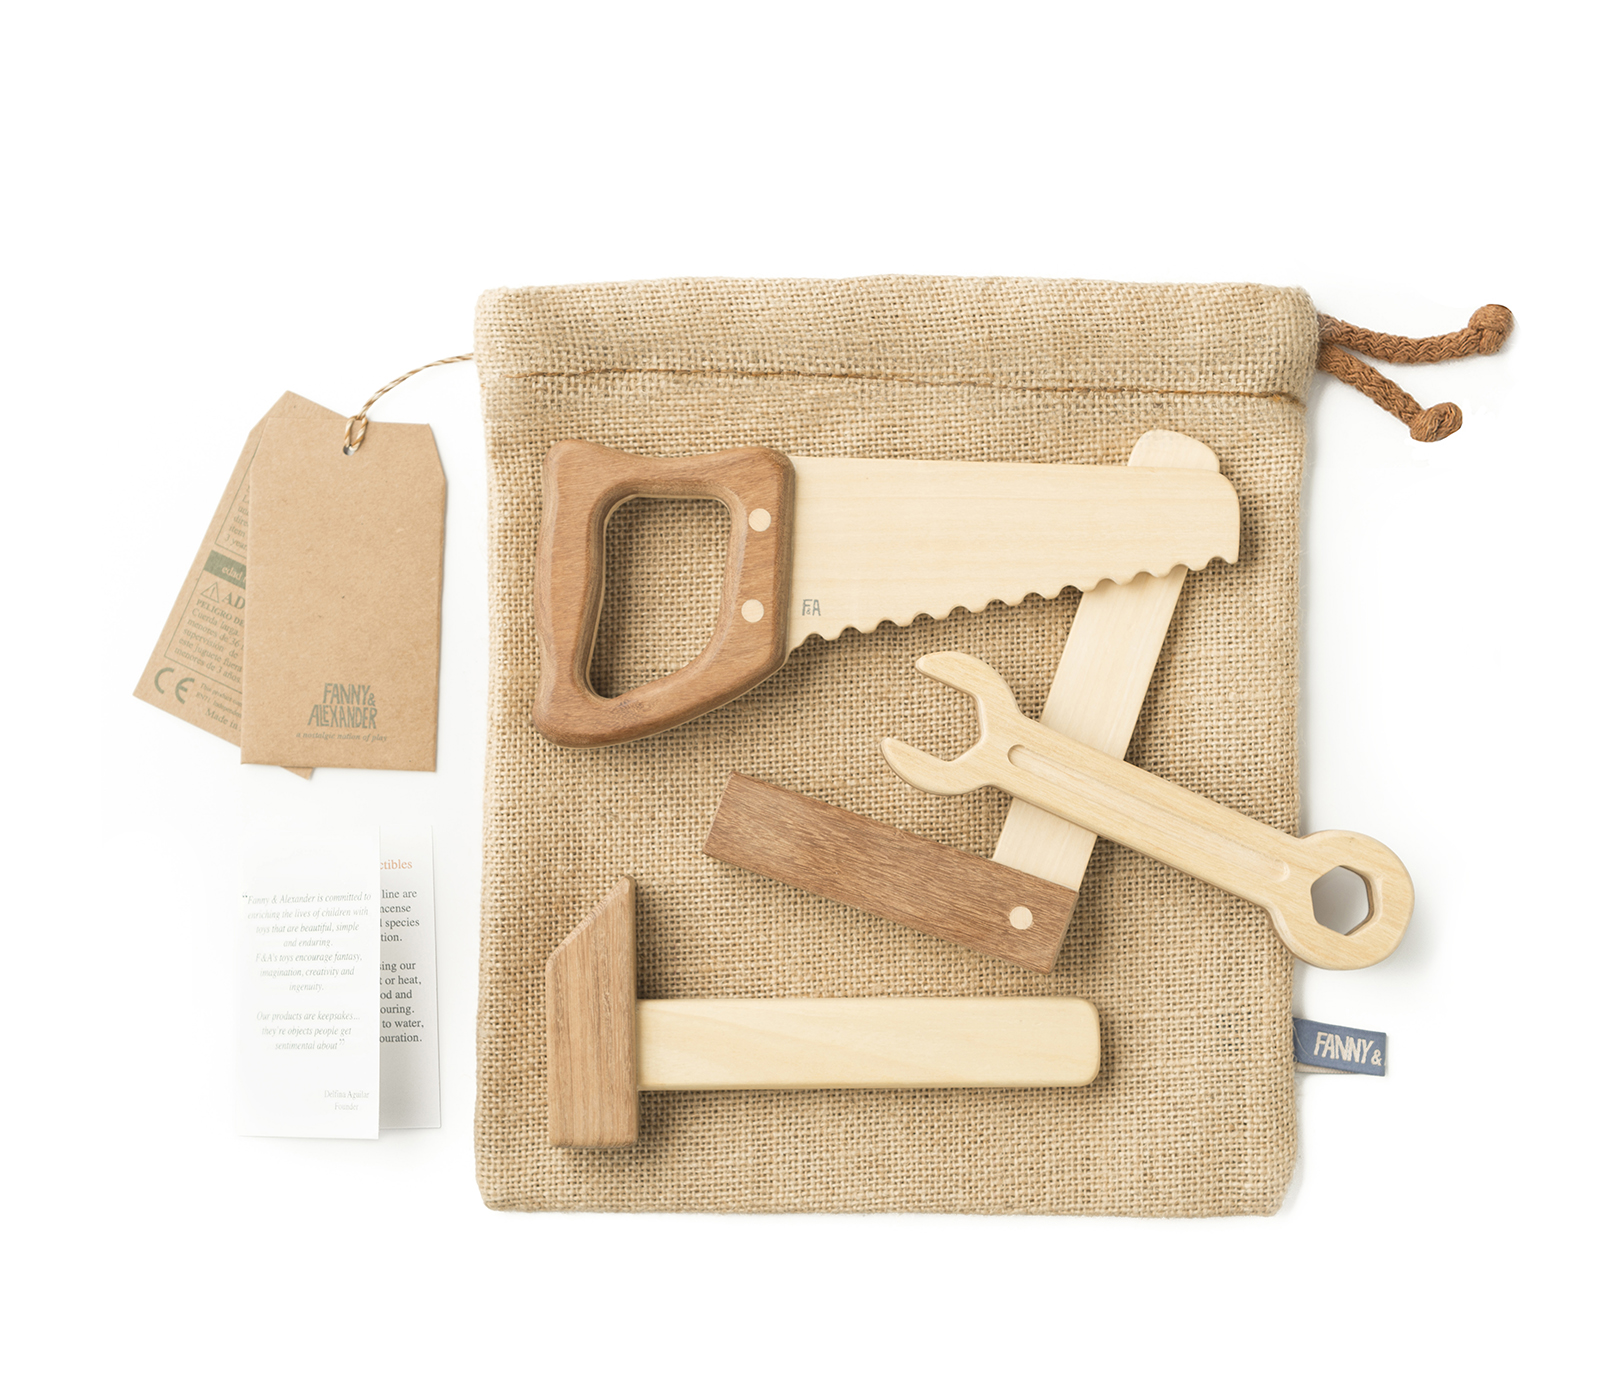 Leo & Bella / Shop / Fanny & Alexander Heirloom Wooden Tool Set